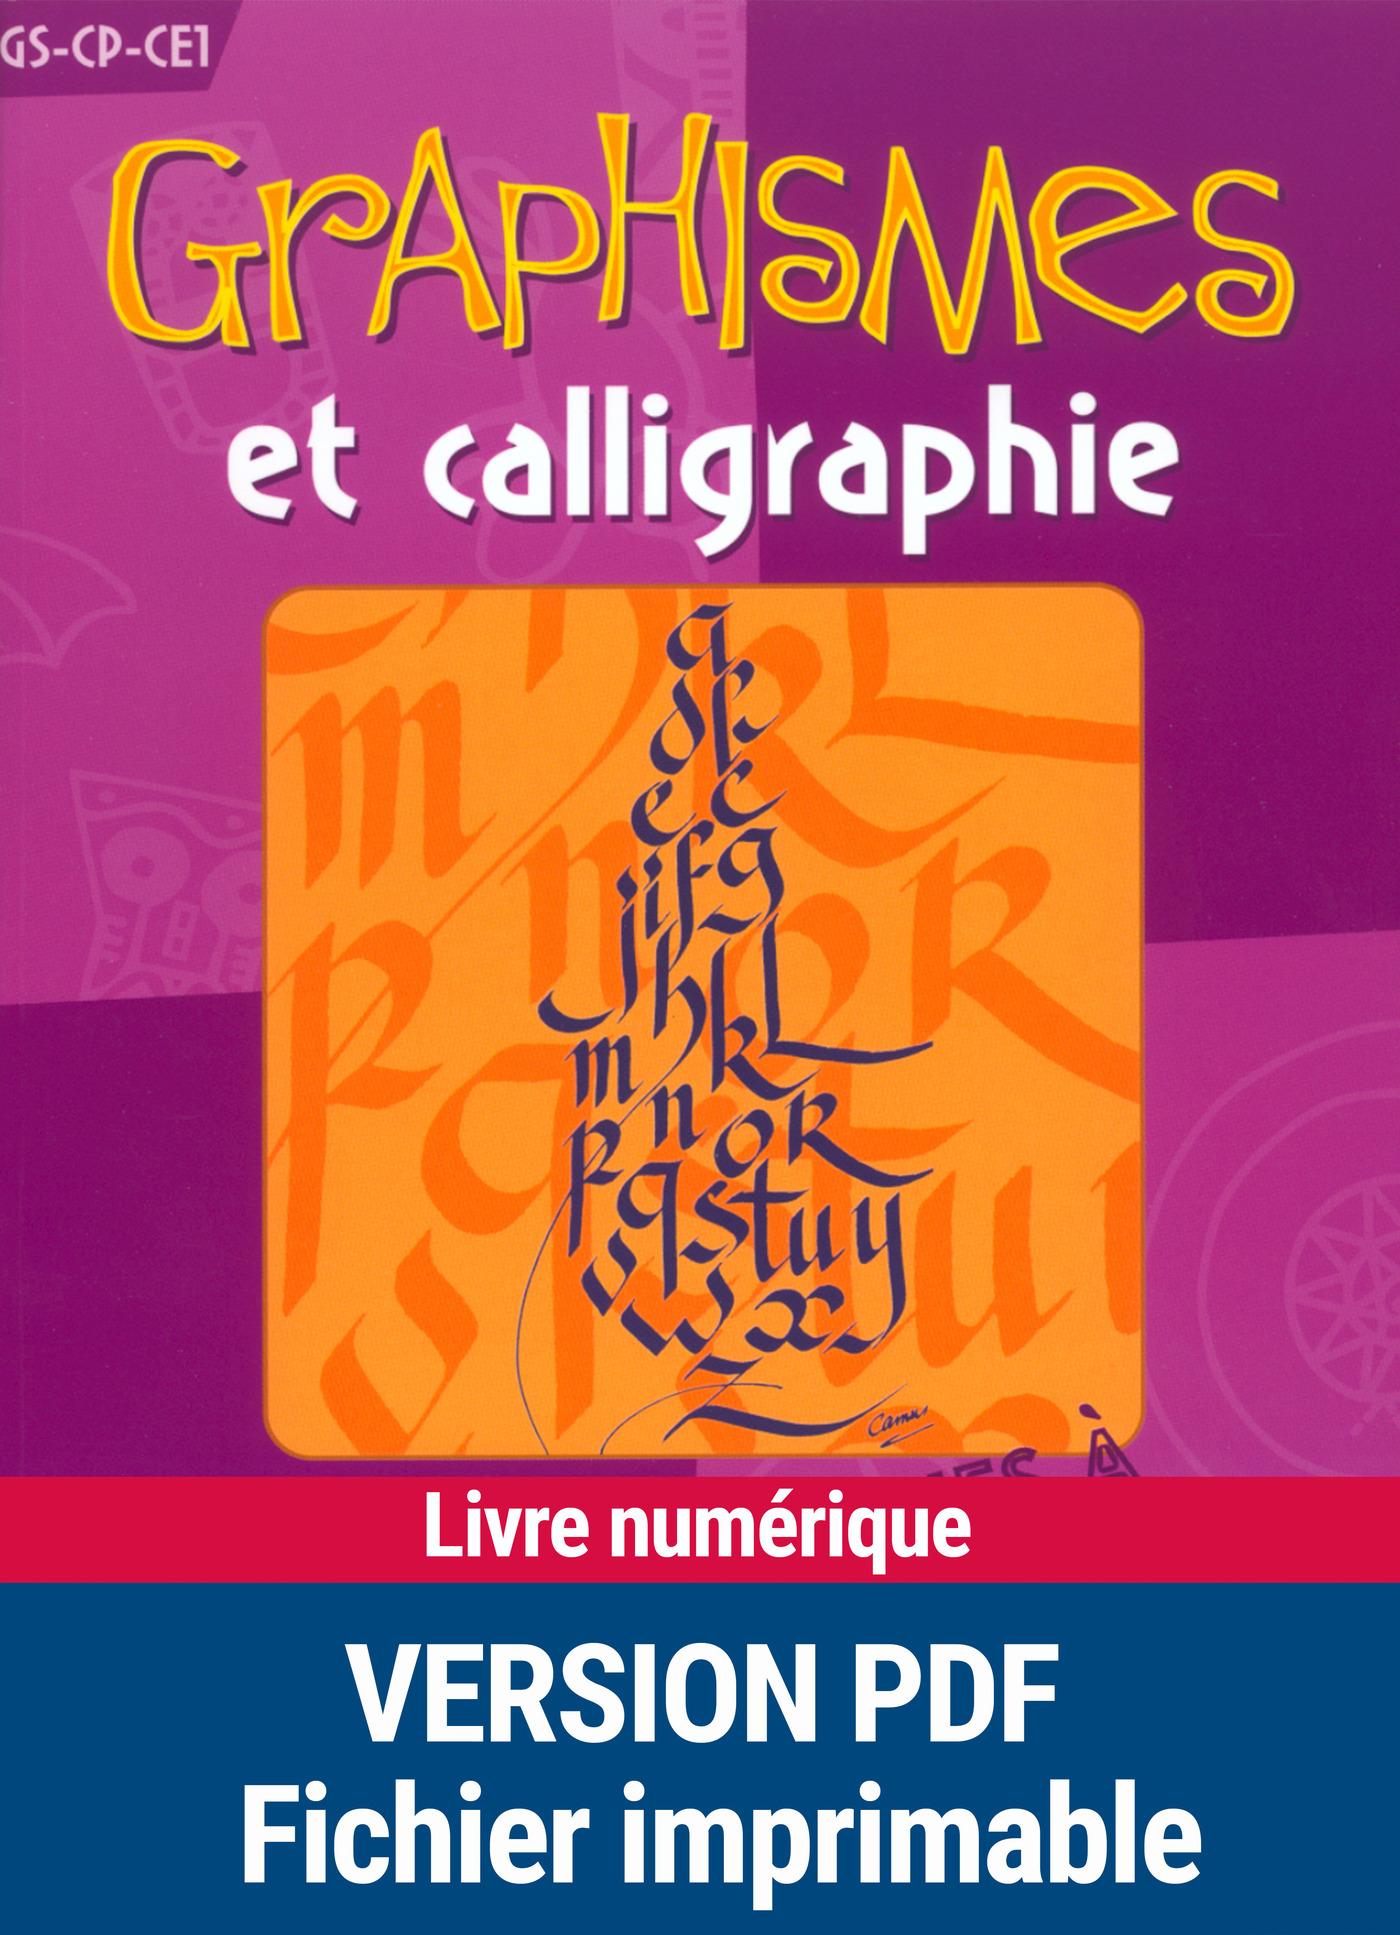 Graphismes et calligraphie